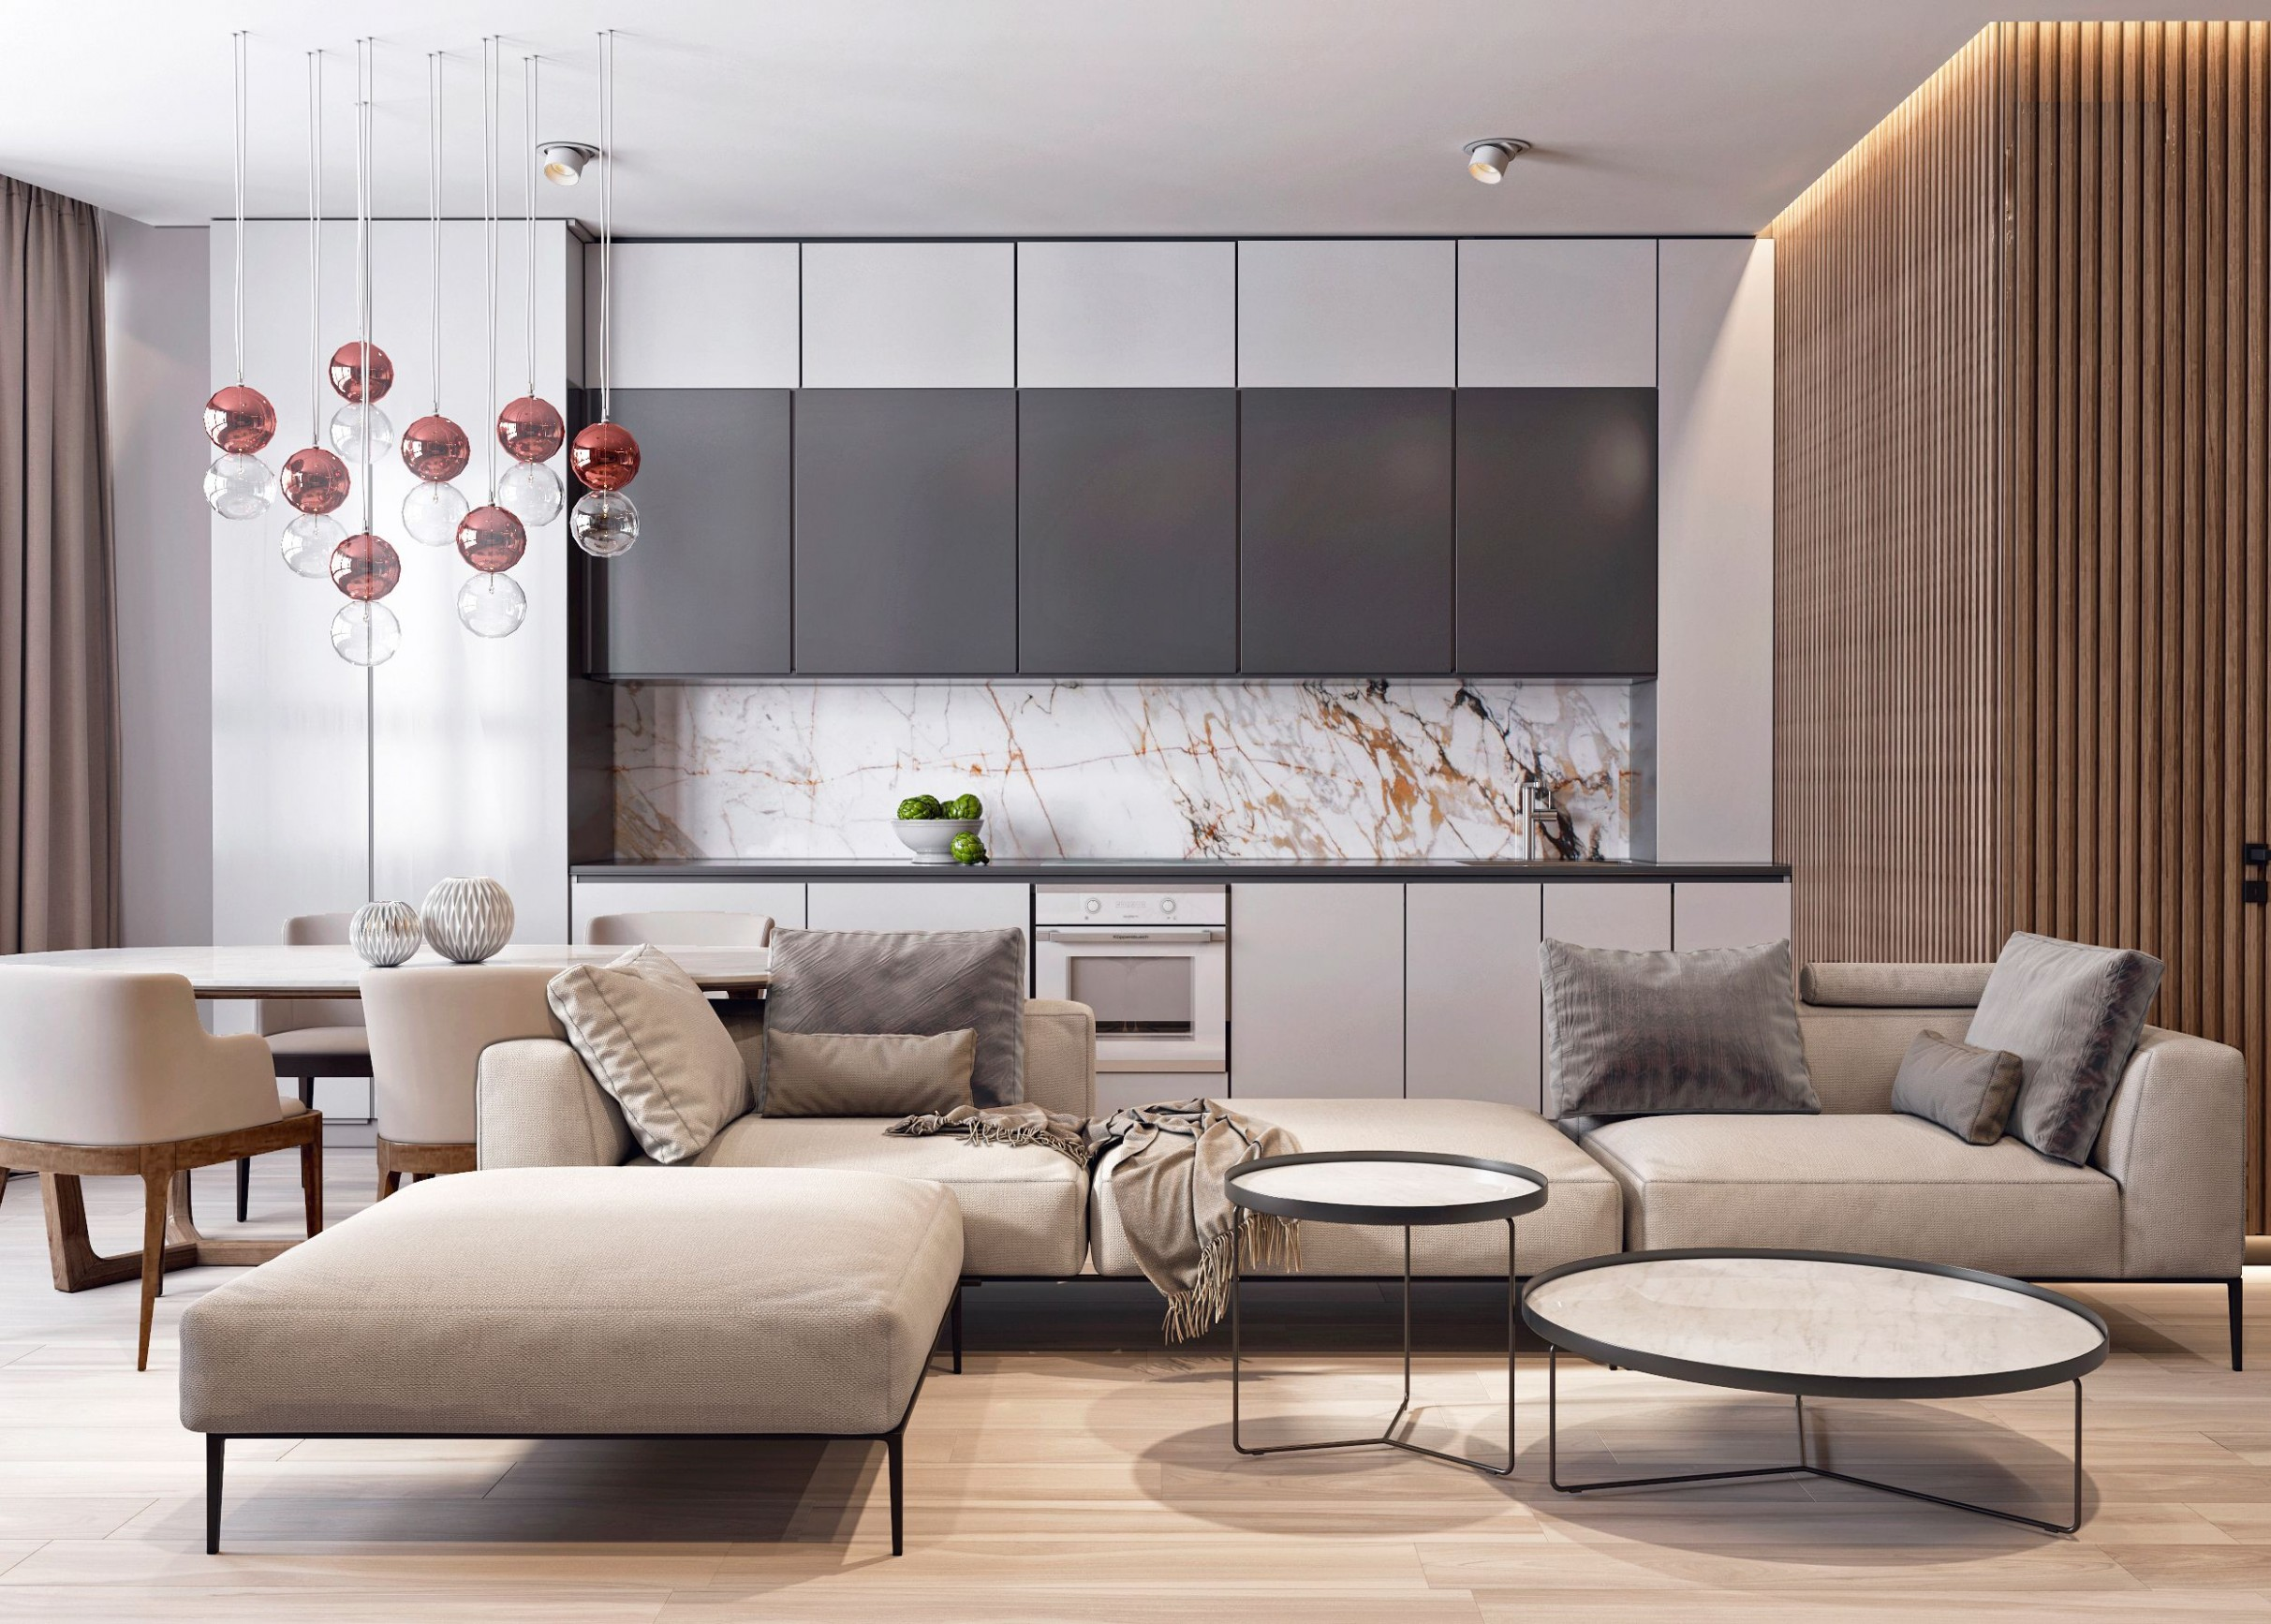 Modern home interior design: best trends of 11 - Hackrea - Apartment Design Trends 2021